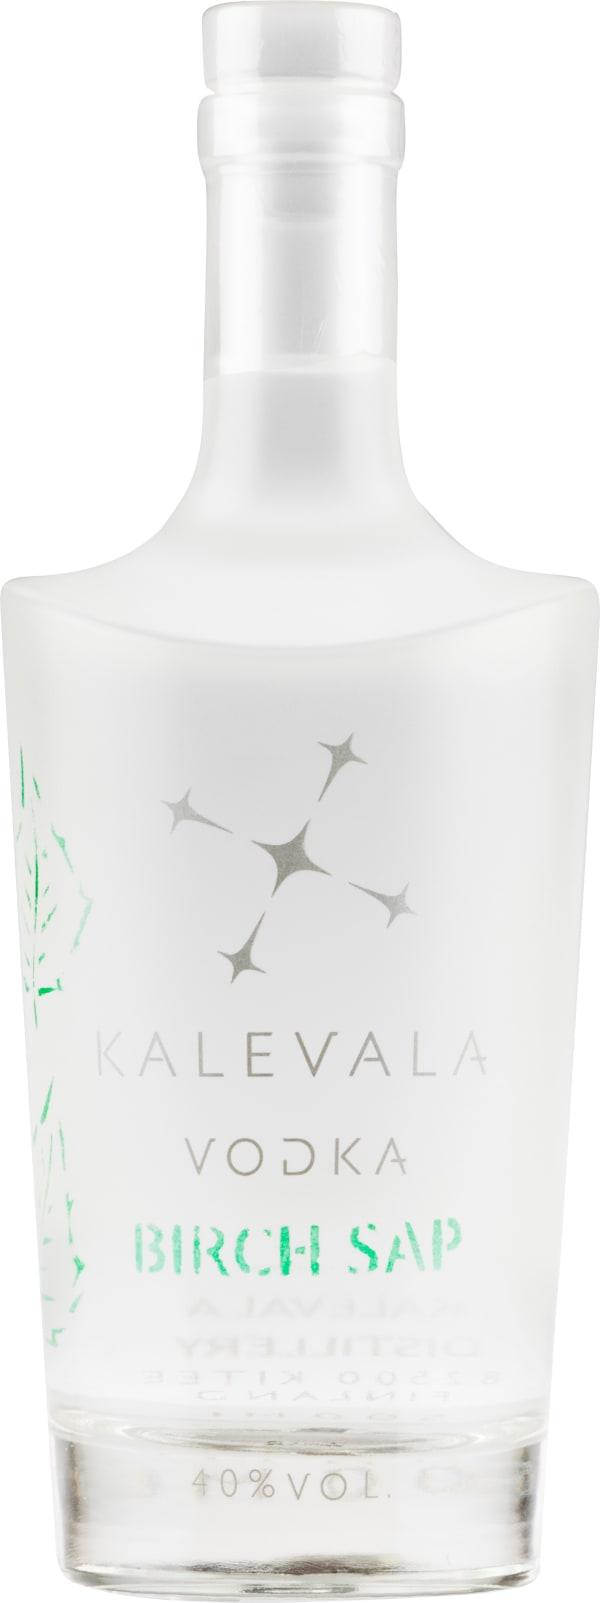 Kalevala Vodka Birch Sap